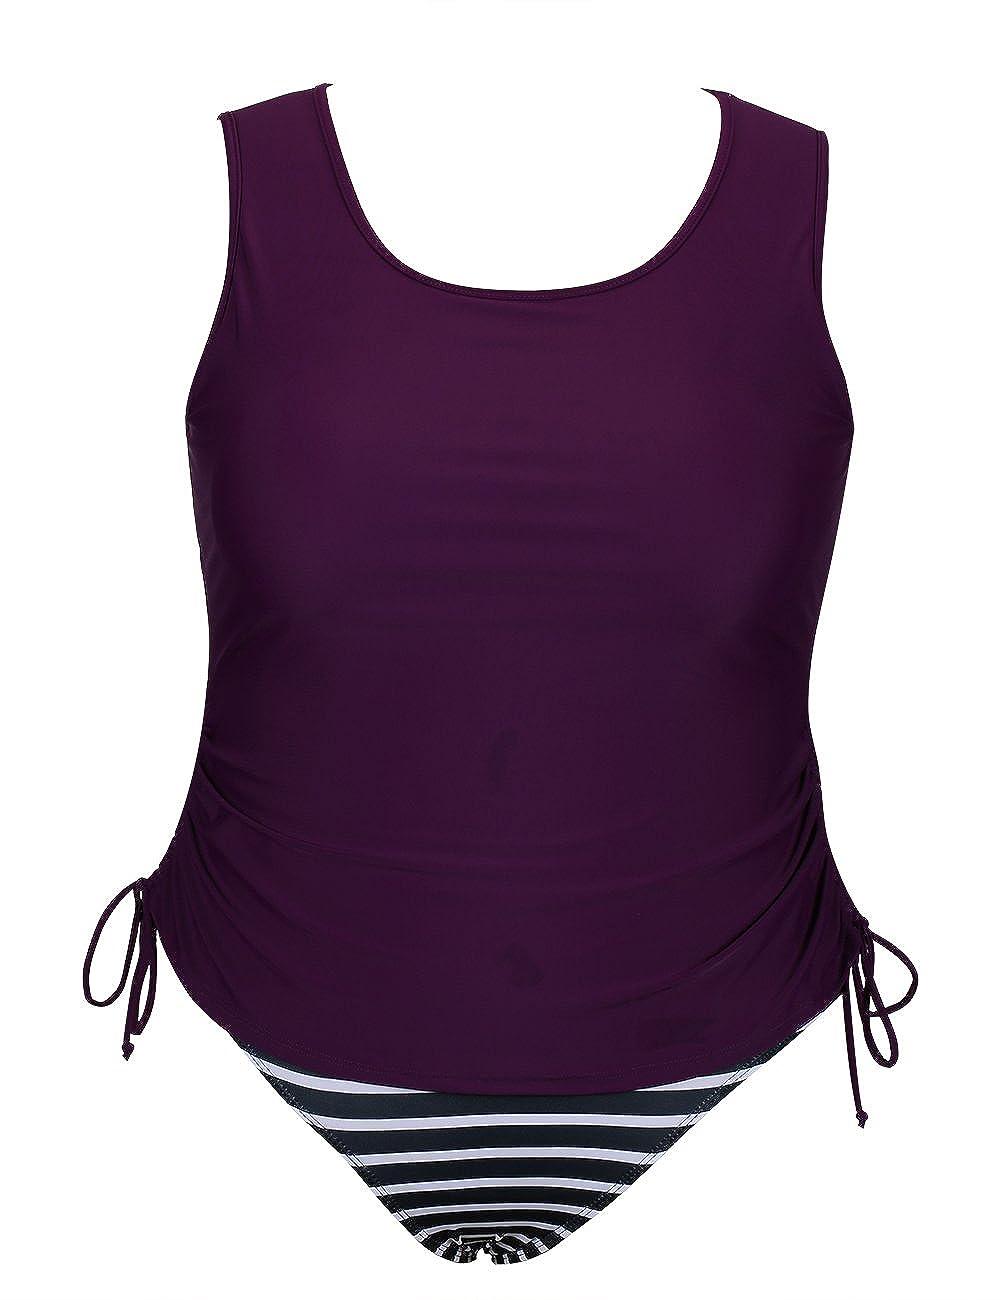 BANDEA Plus Size Tankini Swimsuit, Tummy Control Two Piece Bathing Suit for Women